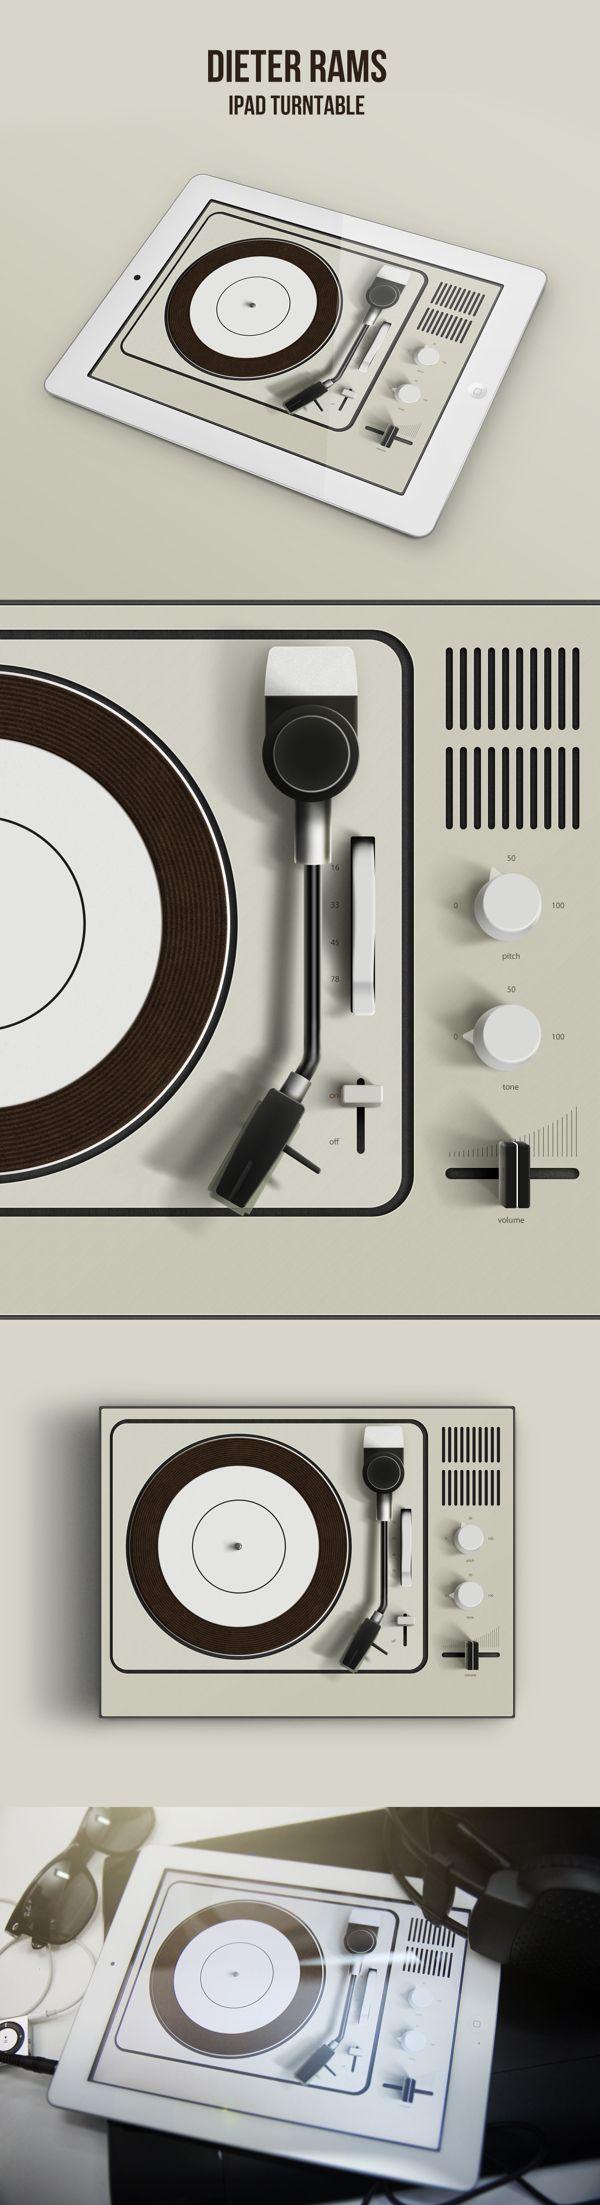 Dieter Rams Ipad Turntable by Denis Shepovalov, via Behance